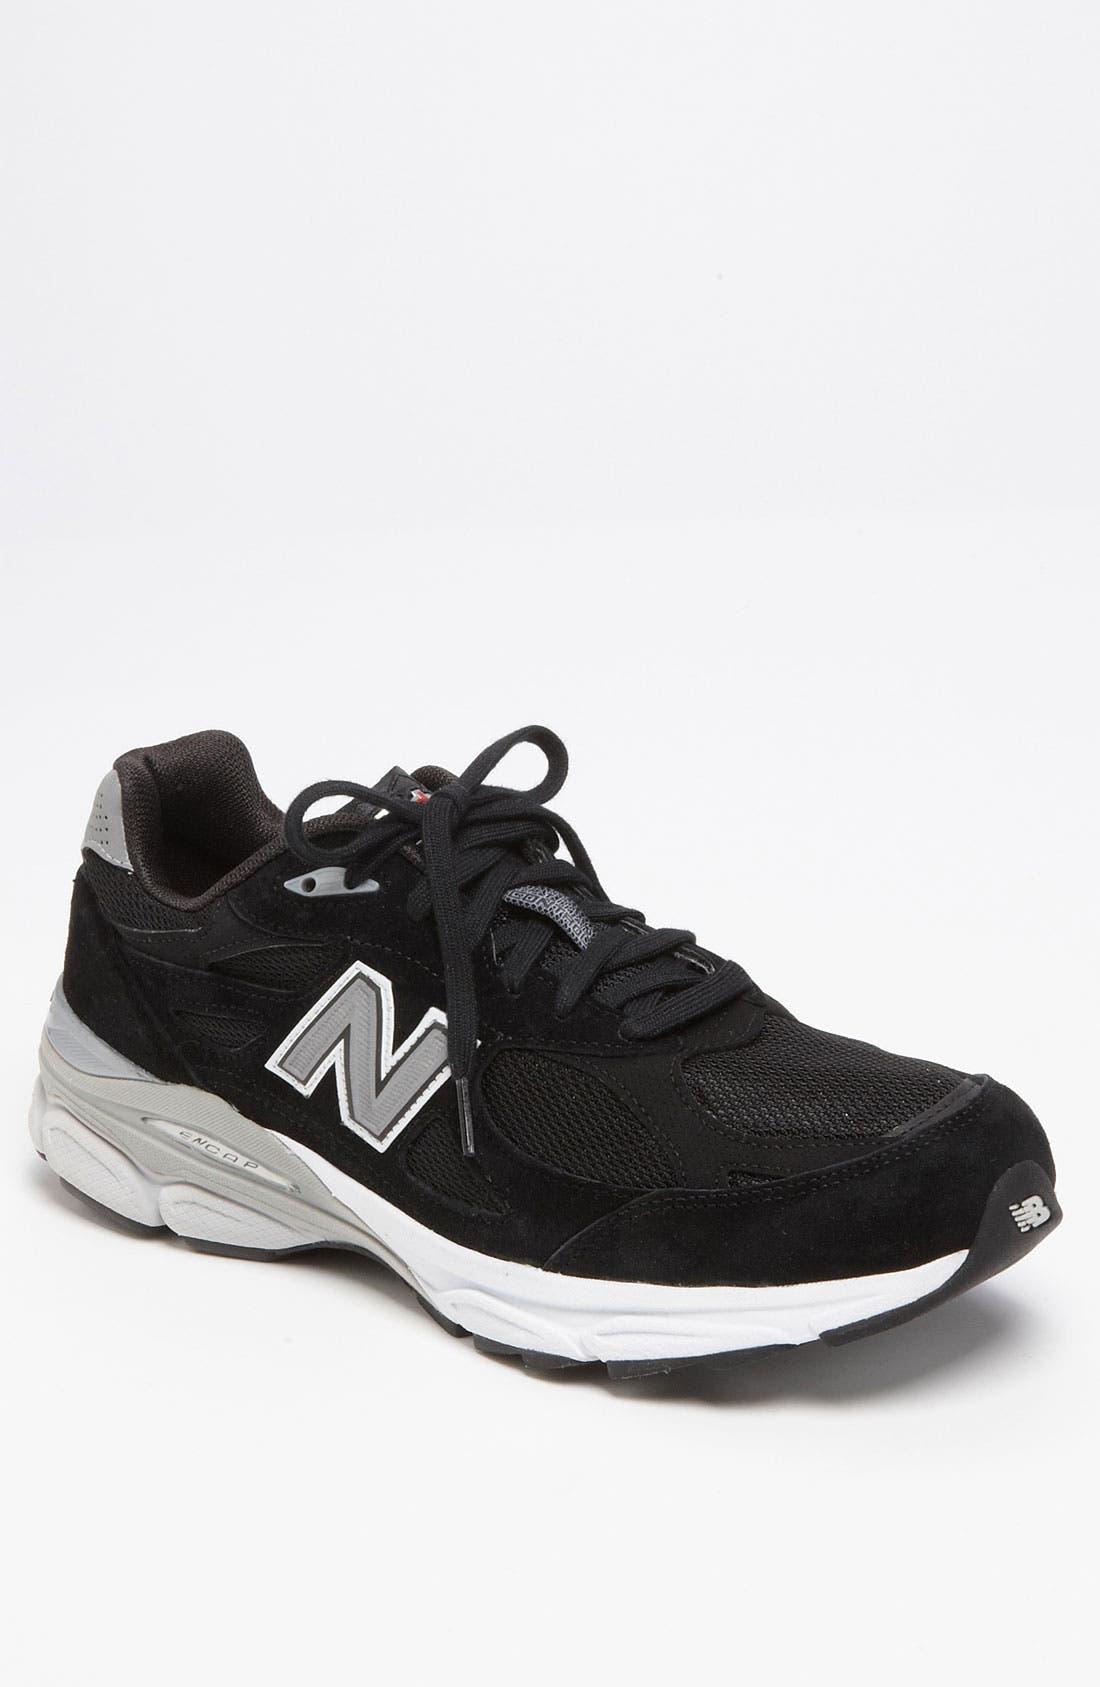 NEW BALANCE '990' Running Shoe, Main, color, 001